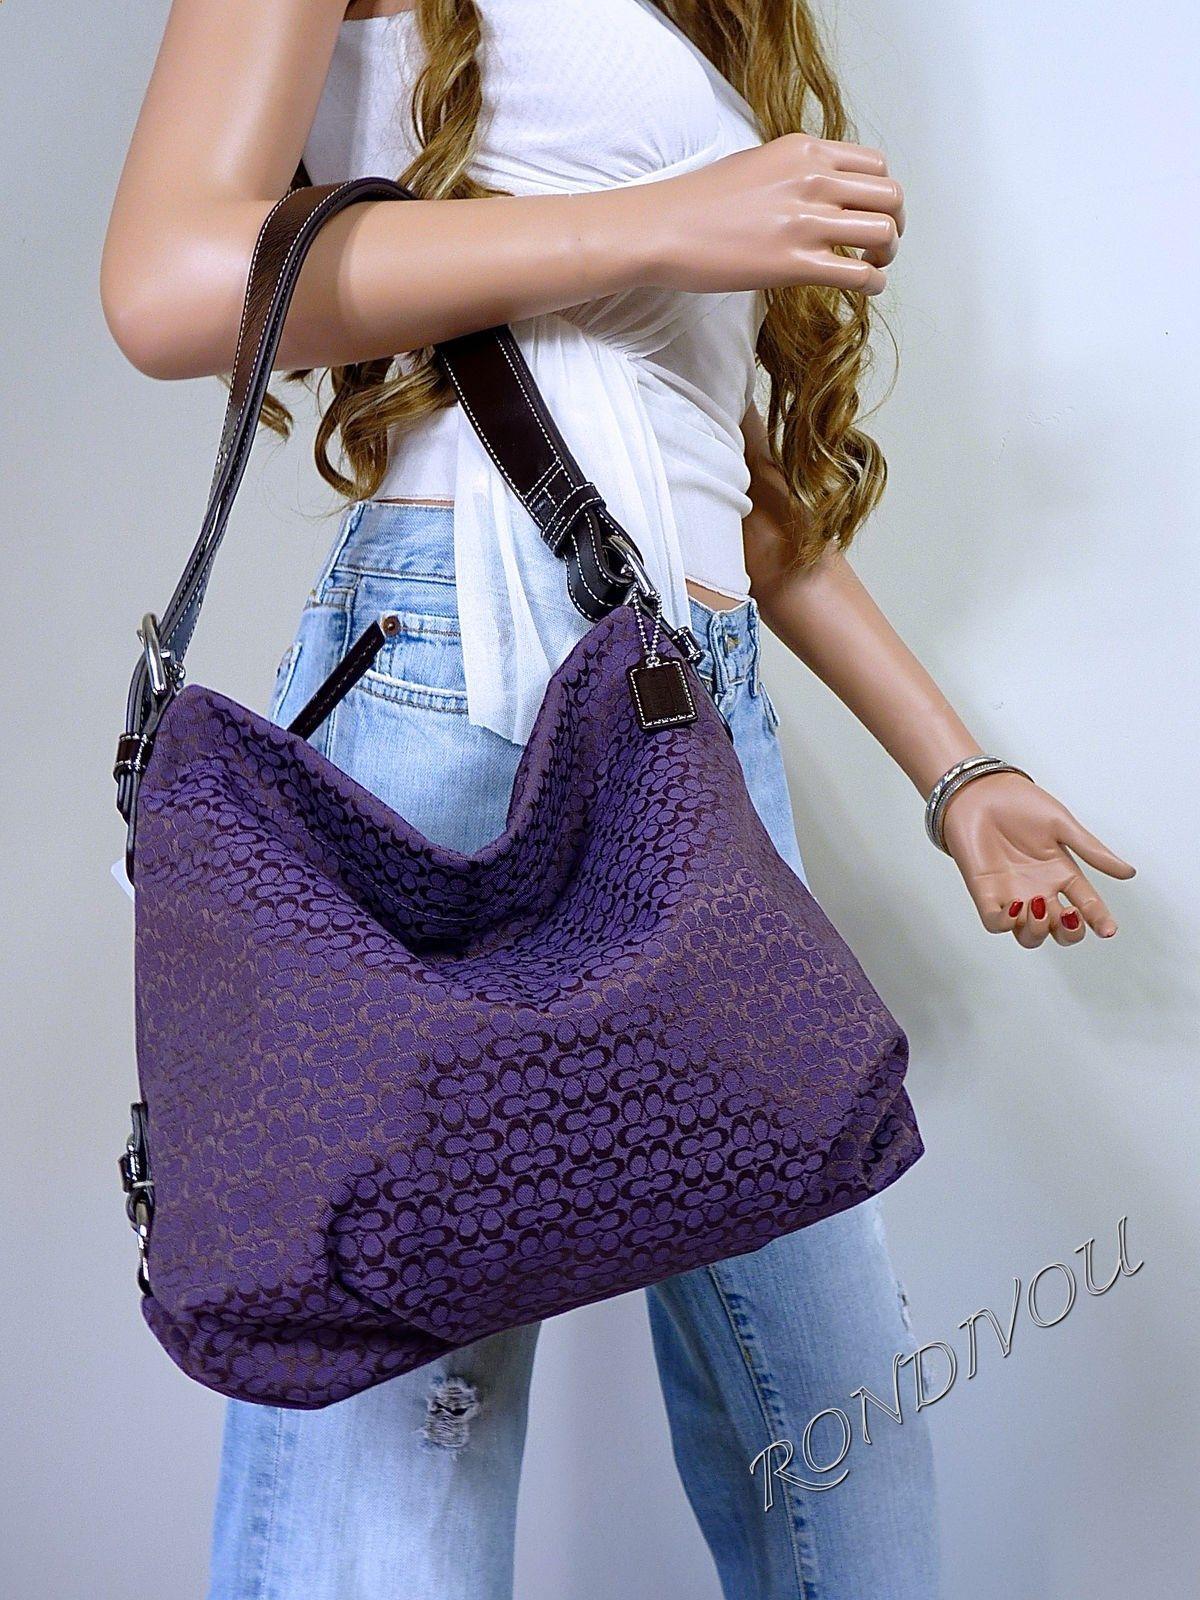 Coach RARE Purple Medium Signature Hobo Shoulder Crossbody Tote Bag Purse    eBay 6d9bb8dcfc